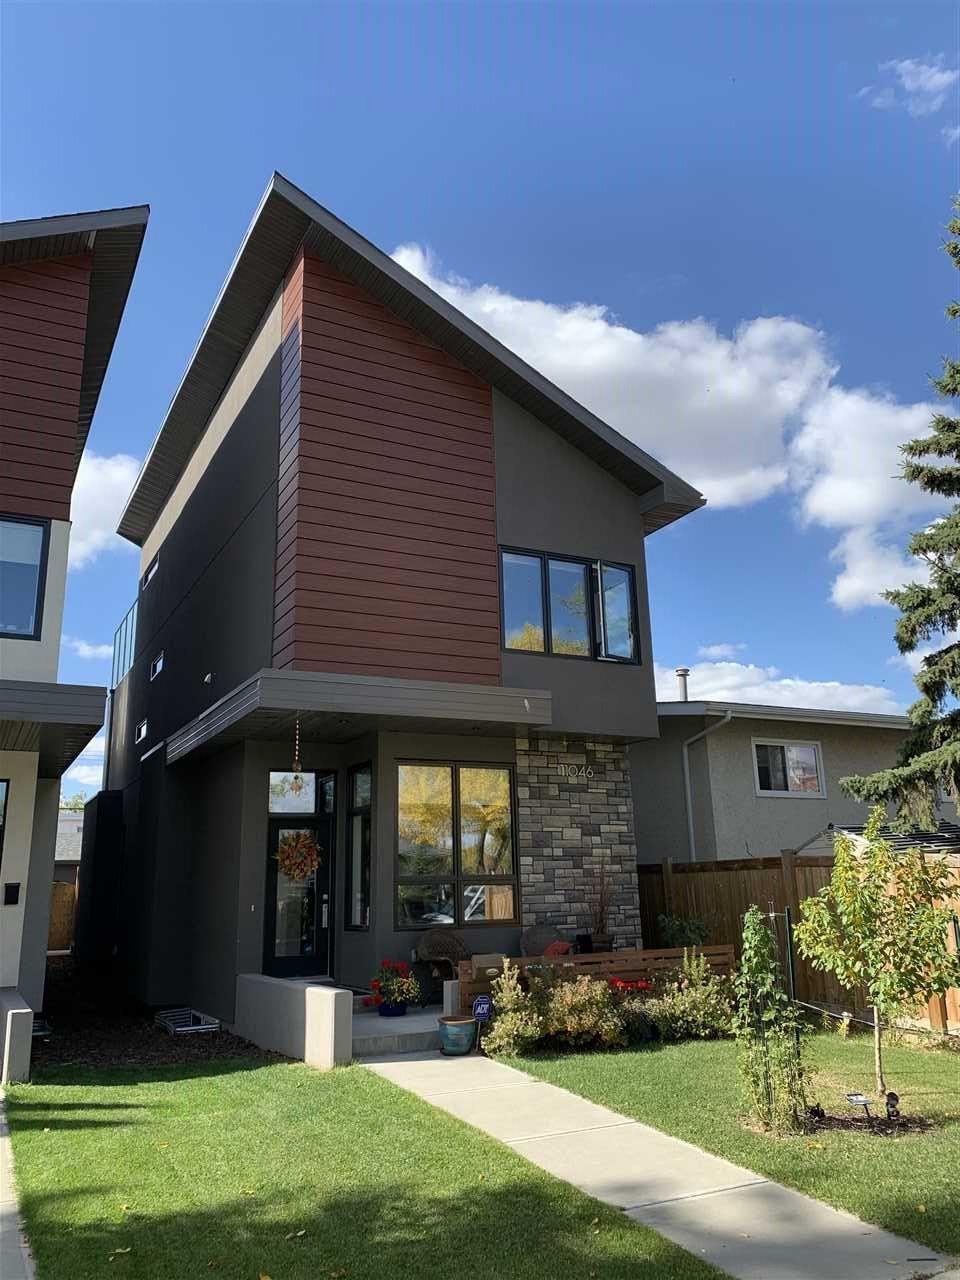 Main Photo: 11046 131 Street in Edmonton: Zone 07 House for sale : MLS®# E4266094